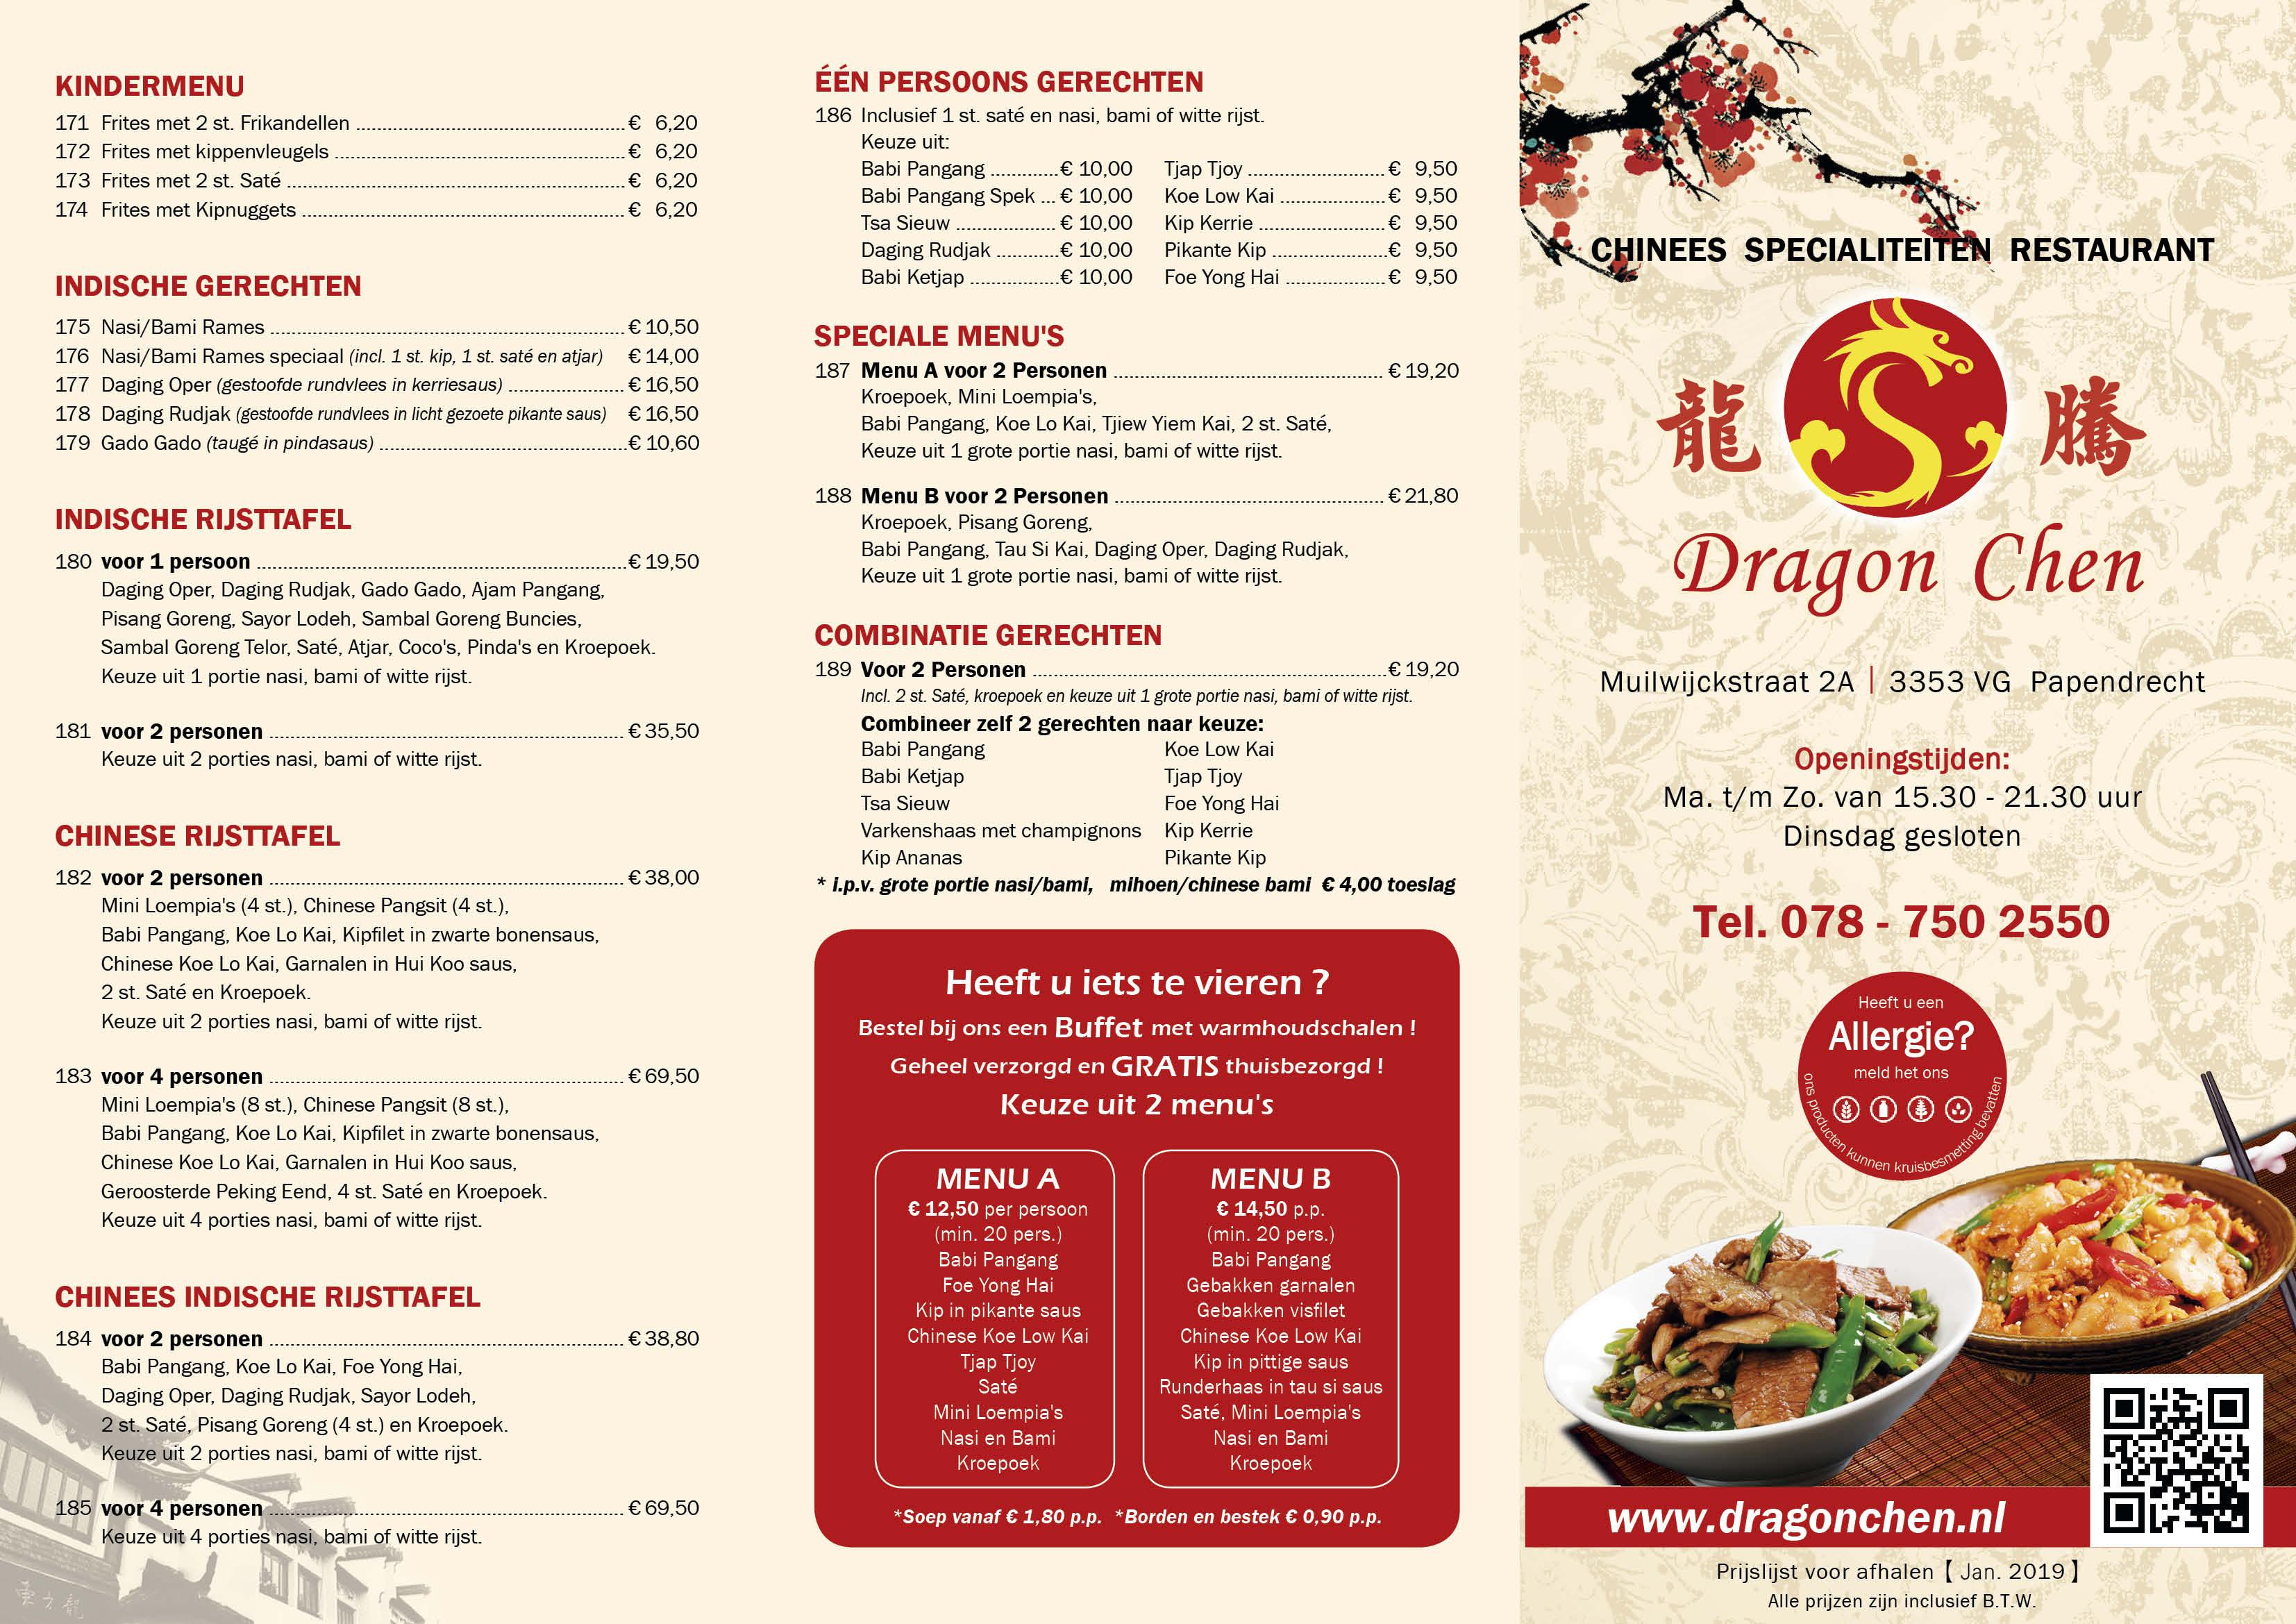 Dragon Chen Afhaalfolder pagina 1